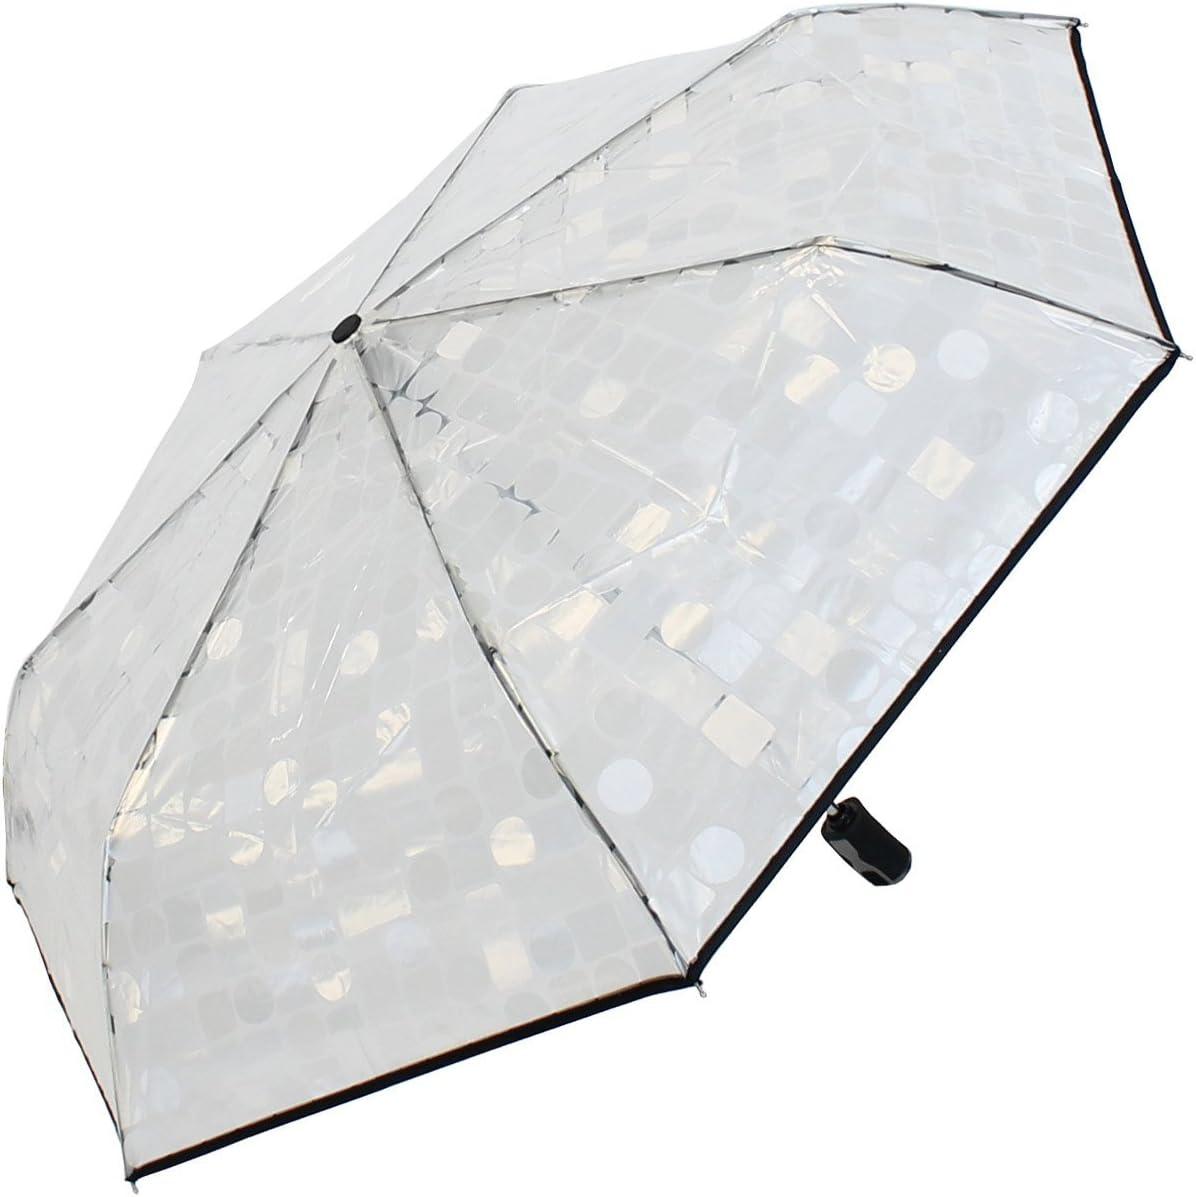 Blau 1PC Transparenter Taschenschirm Modischer Regenschirm Princess C-herry B-lossom Four Colors Akozon Regenschirm